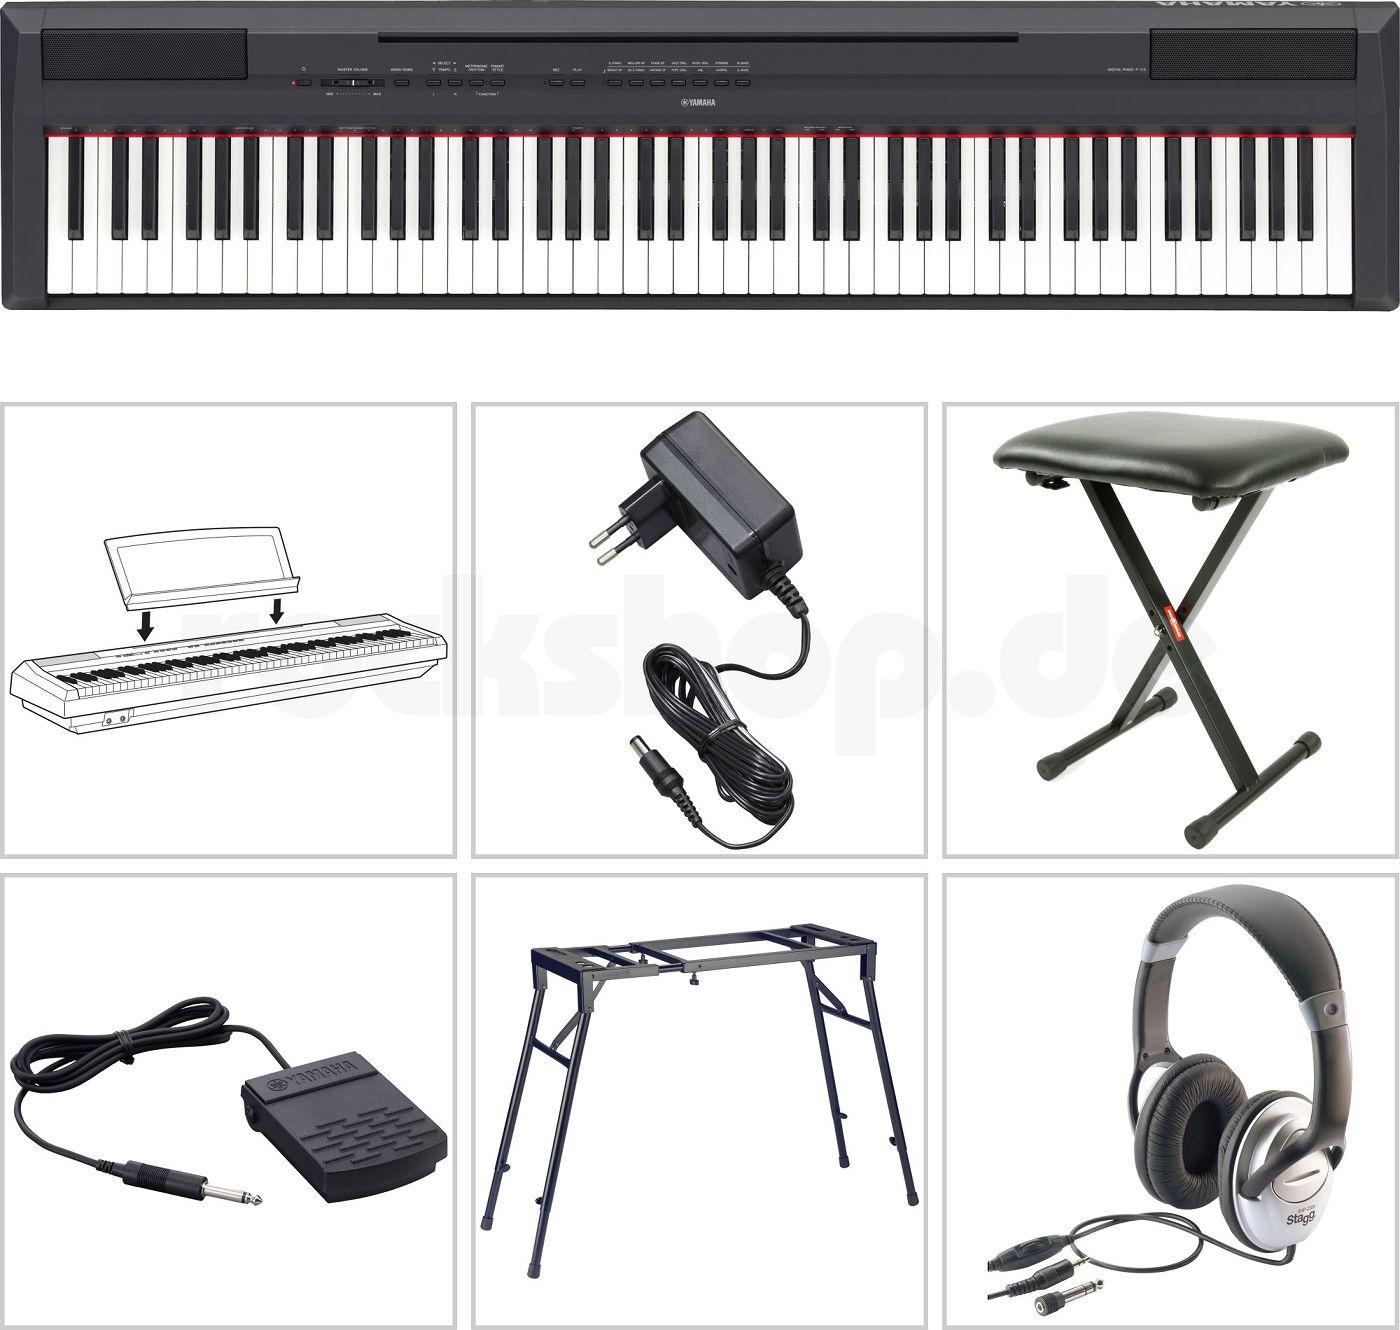 yamaha p 115 b digital e piano klavier mit stativ tisch. Black Bedroom Furniture Sets. Home Design Ideas